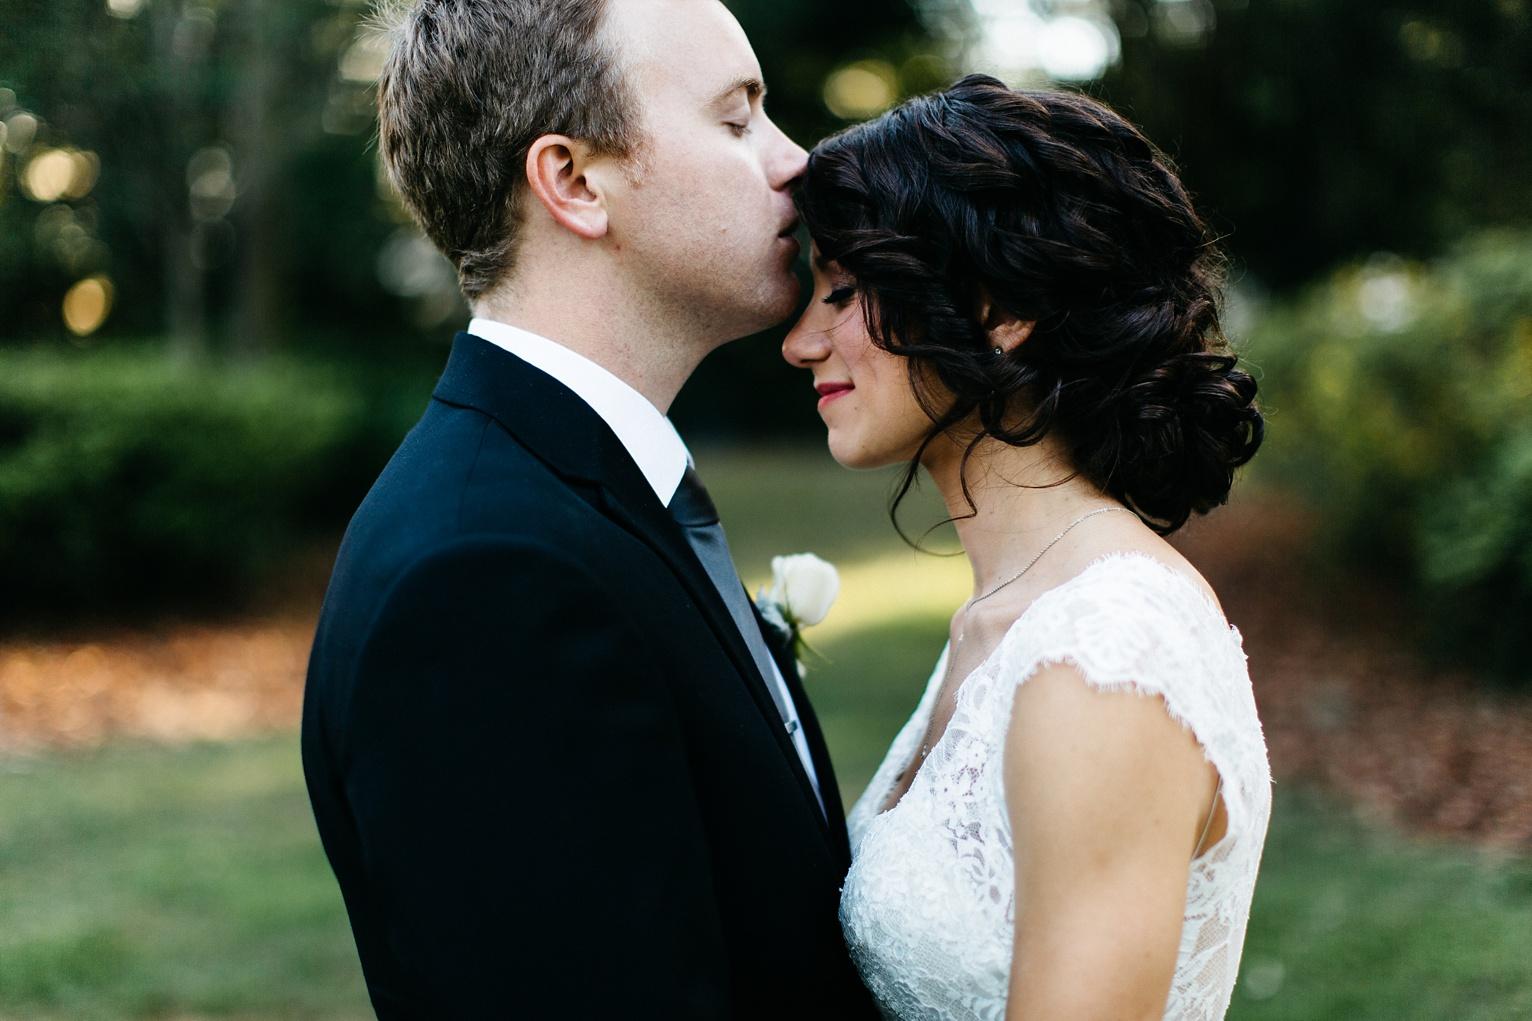 Dreamtownco.com_blog_Stephen&Carly_Wedding_0046.jpg